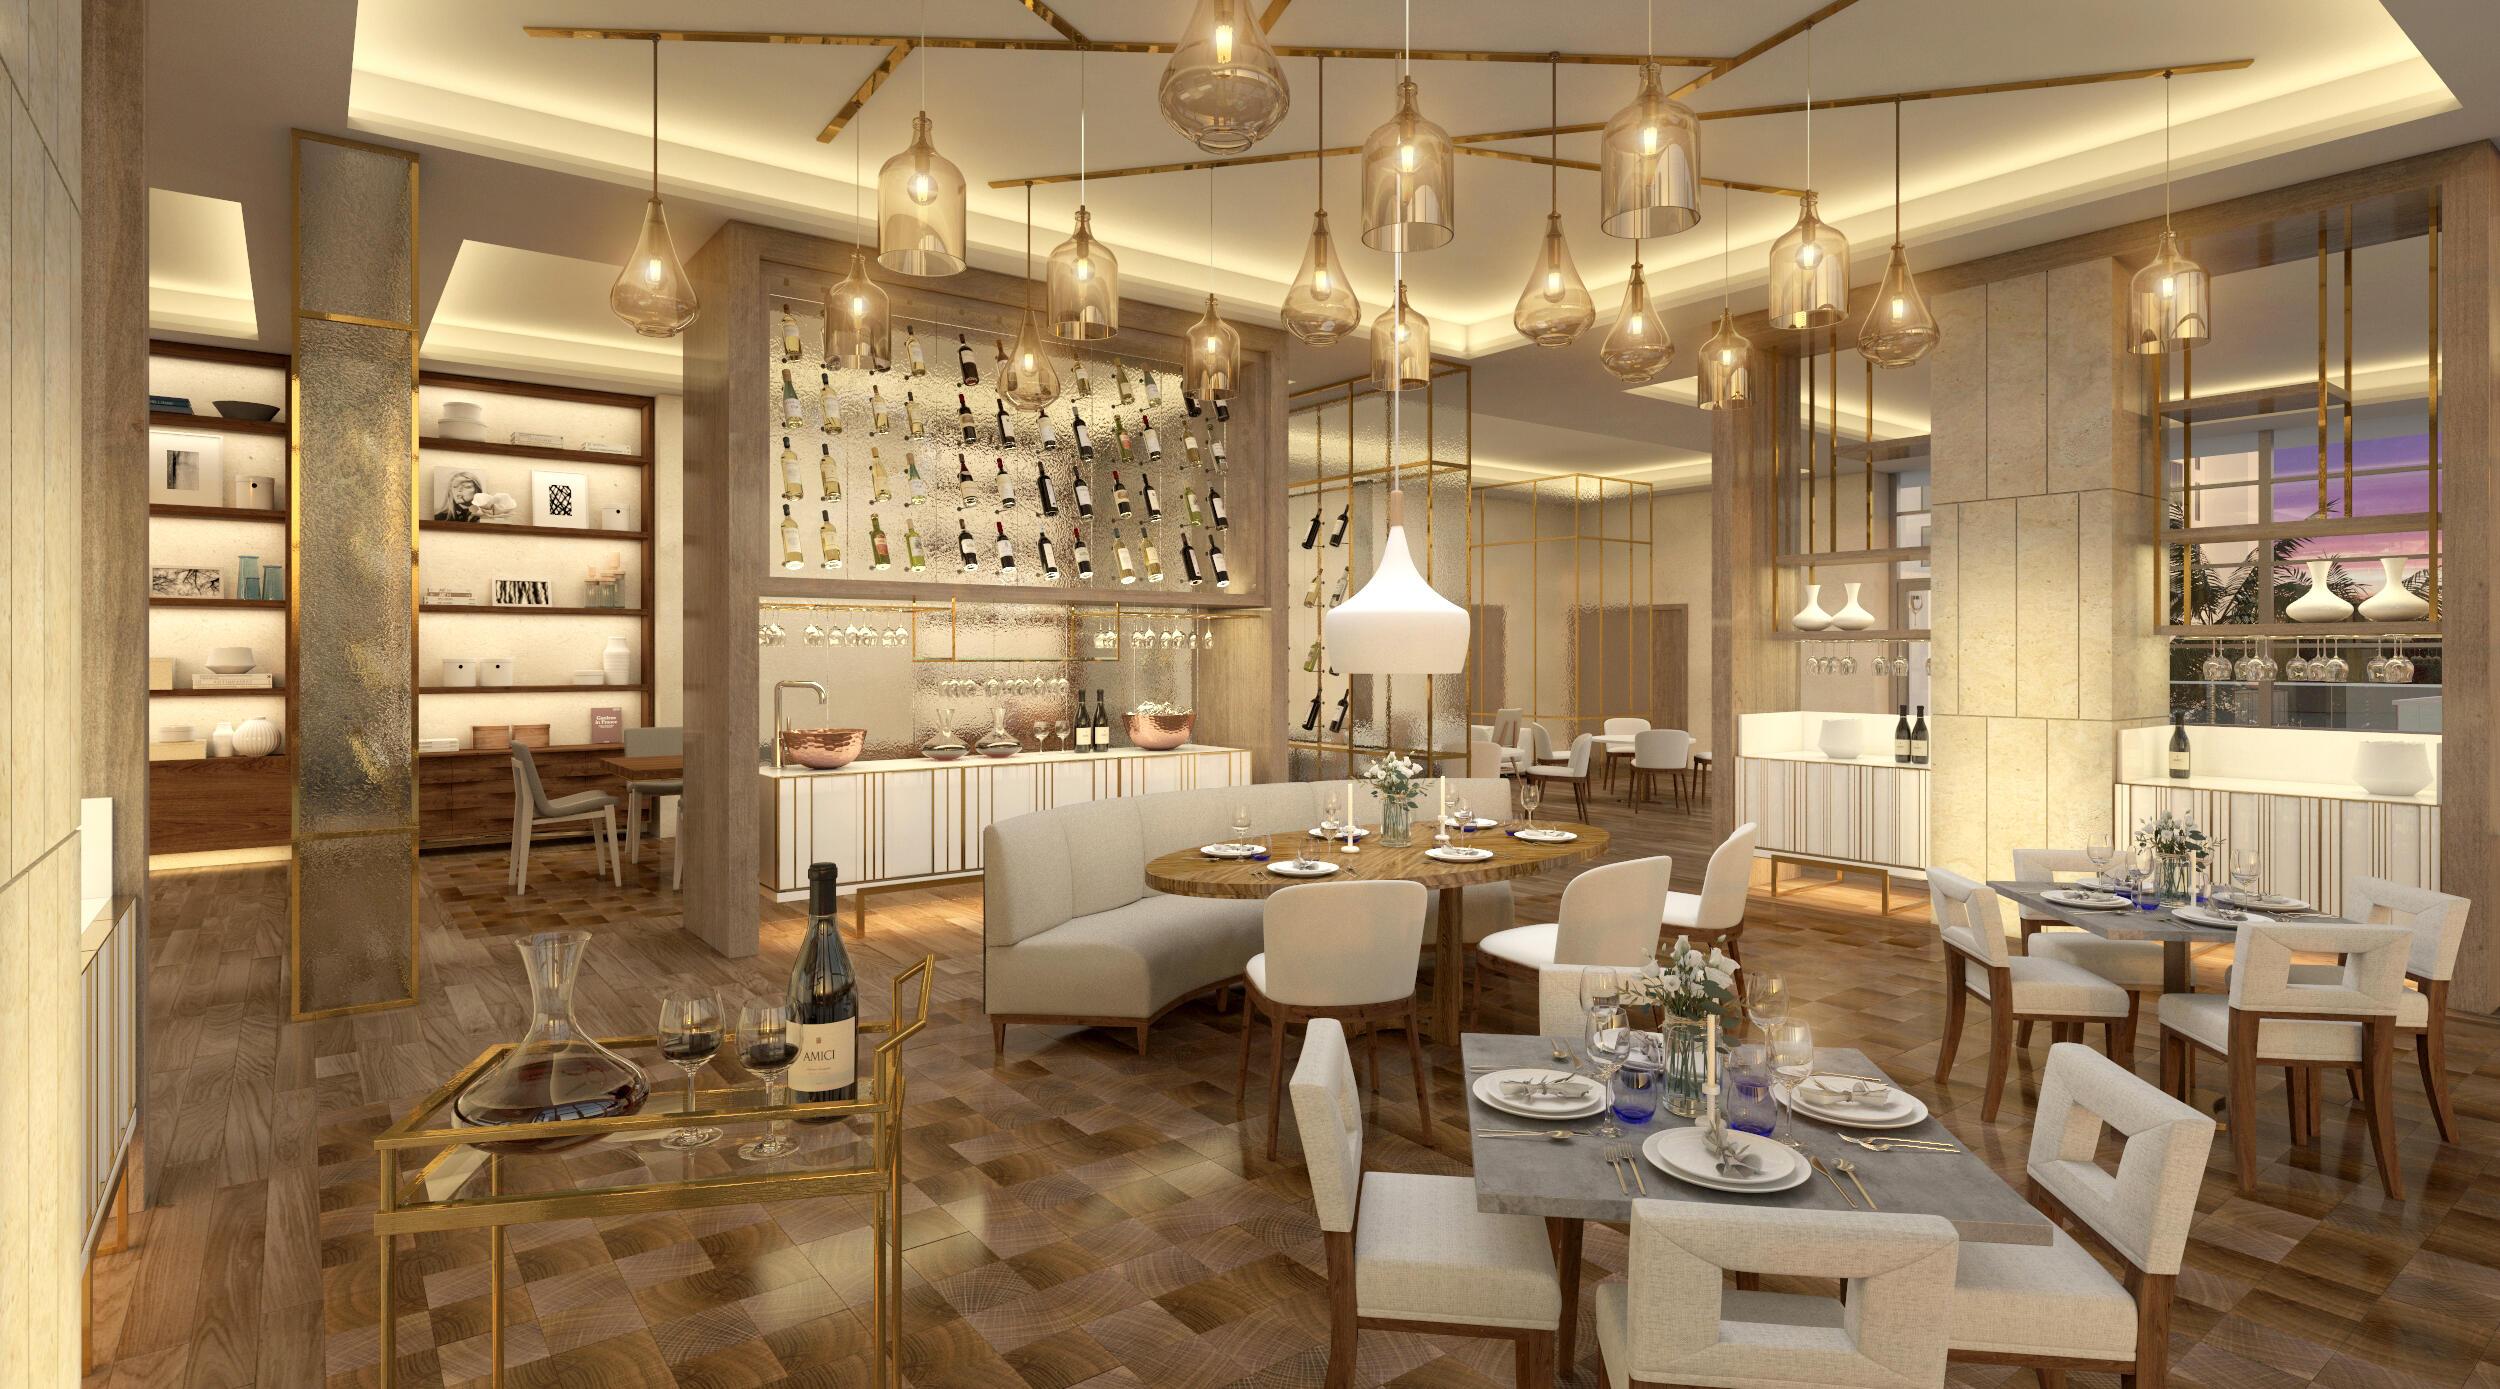 5.Resort Restaurant